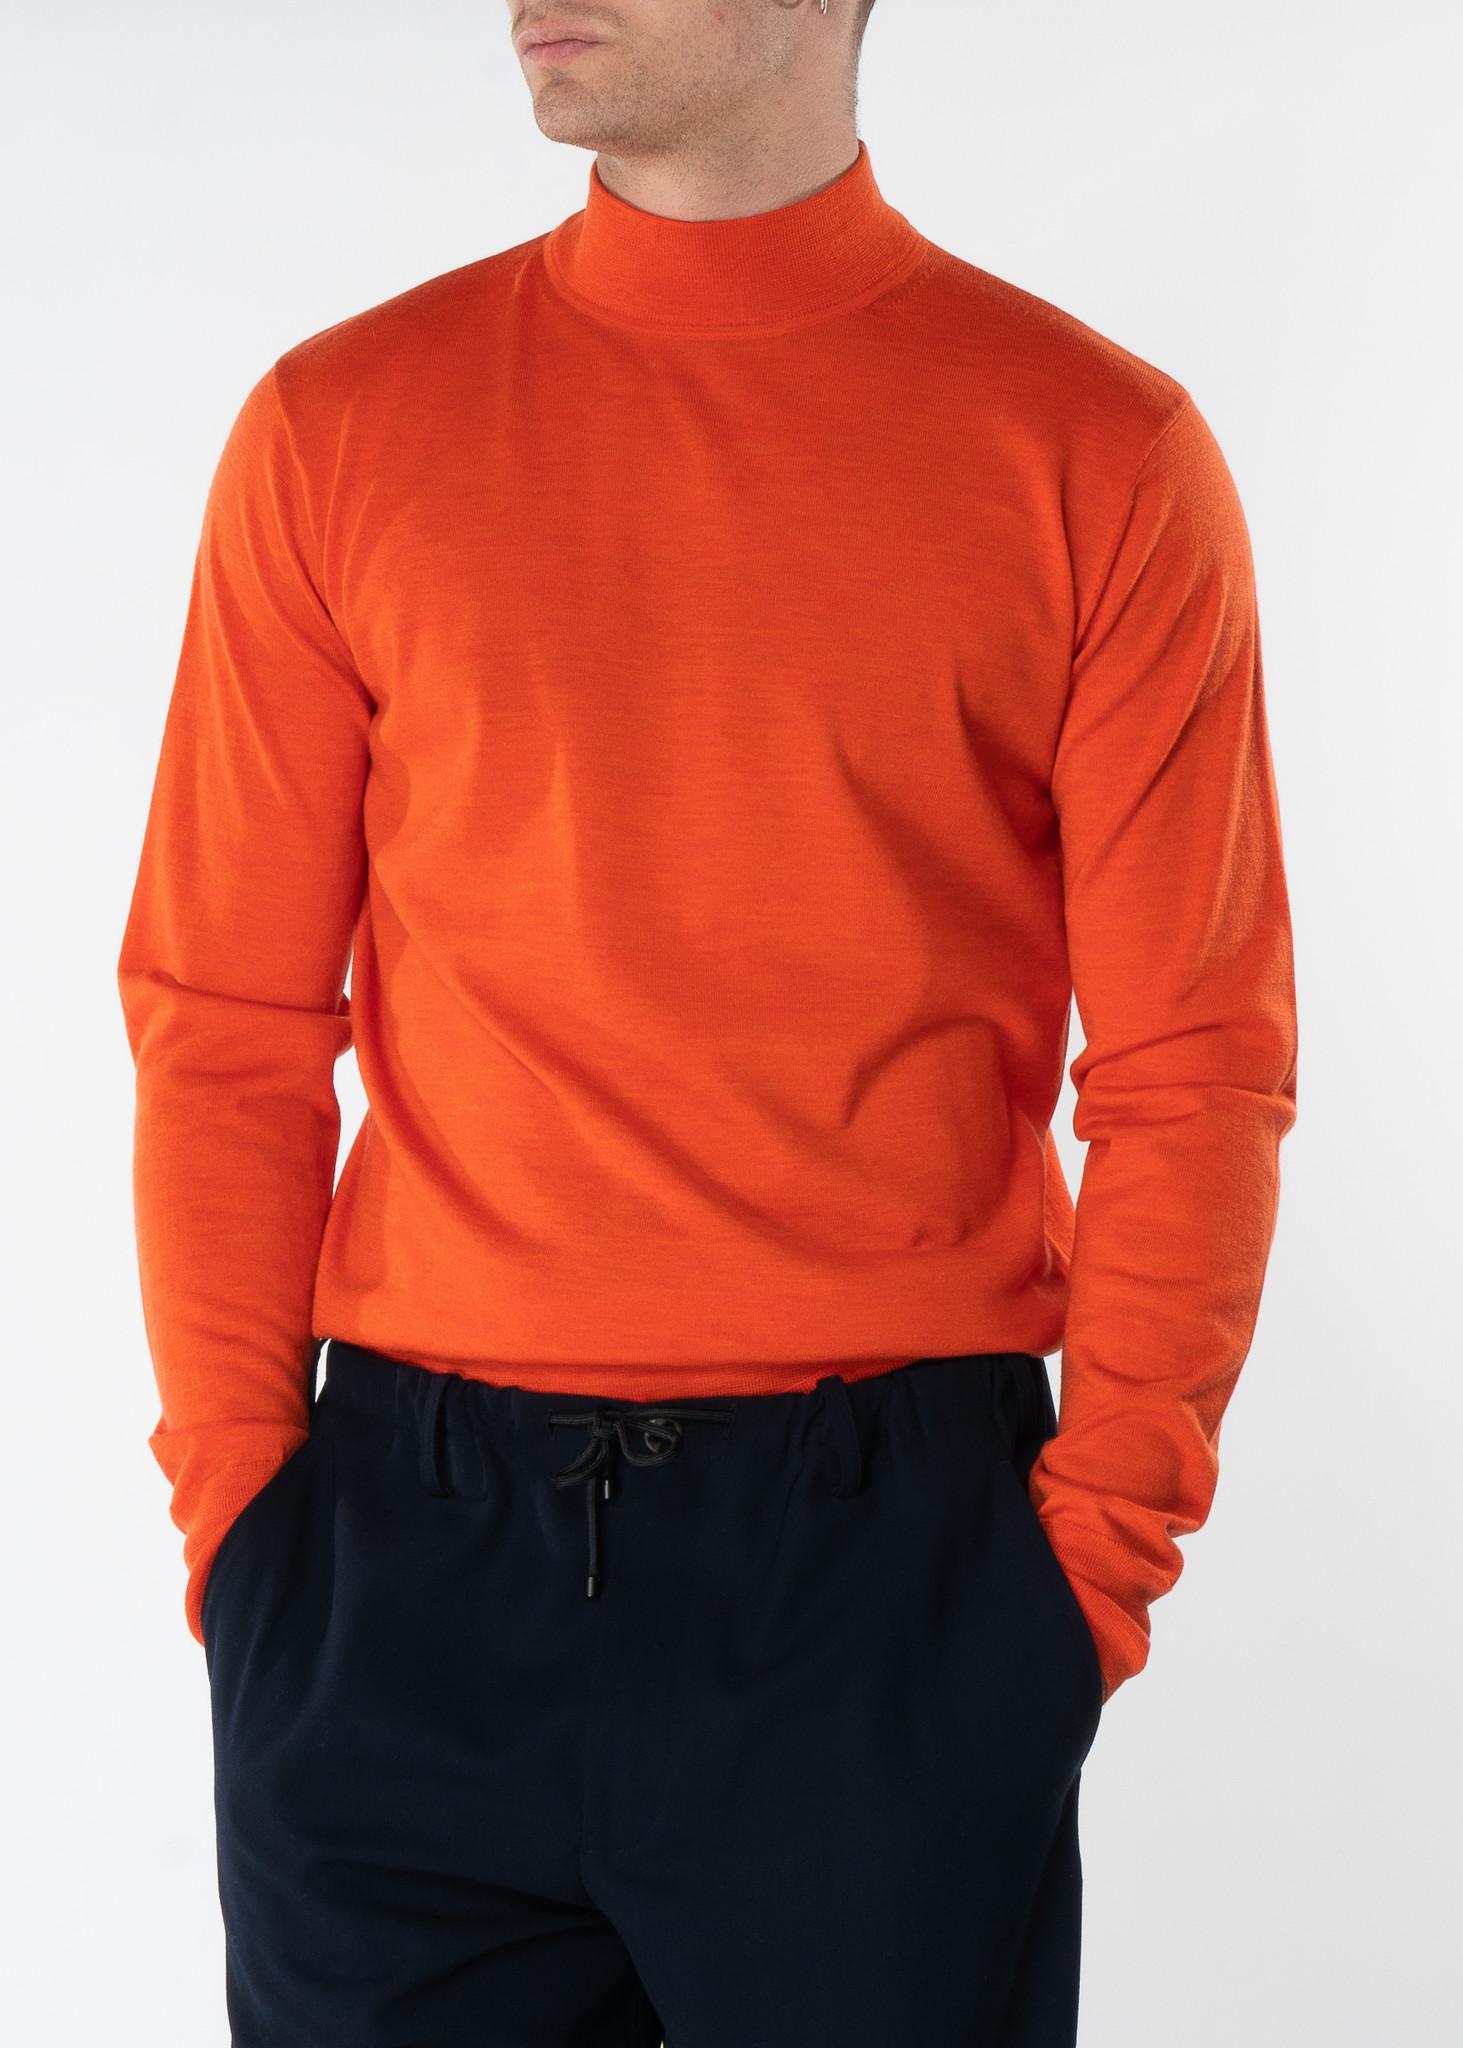 Orange Mock Neck Merino Sweater